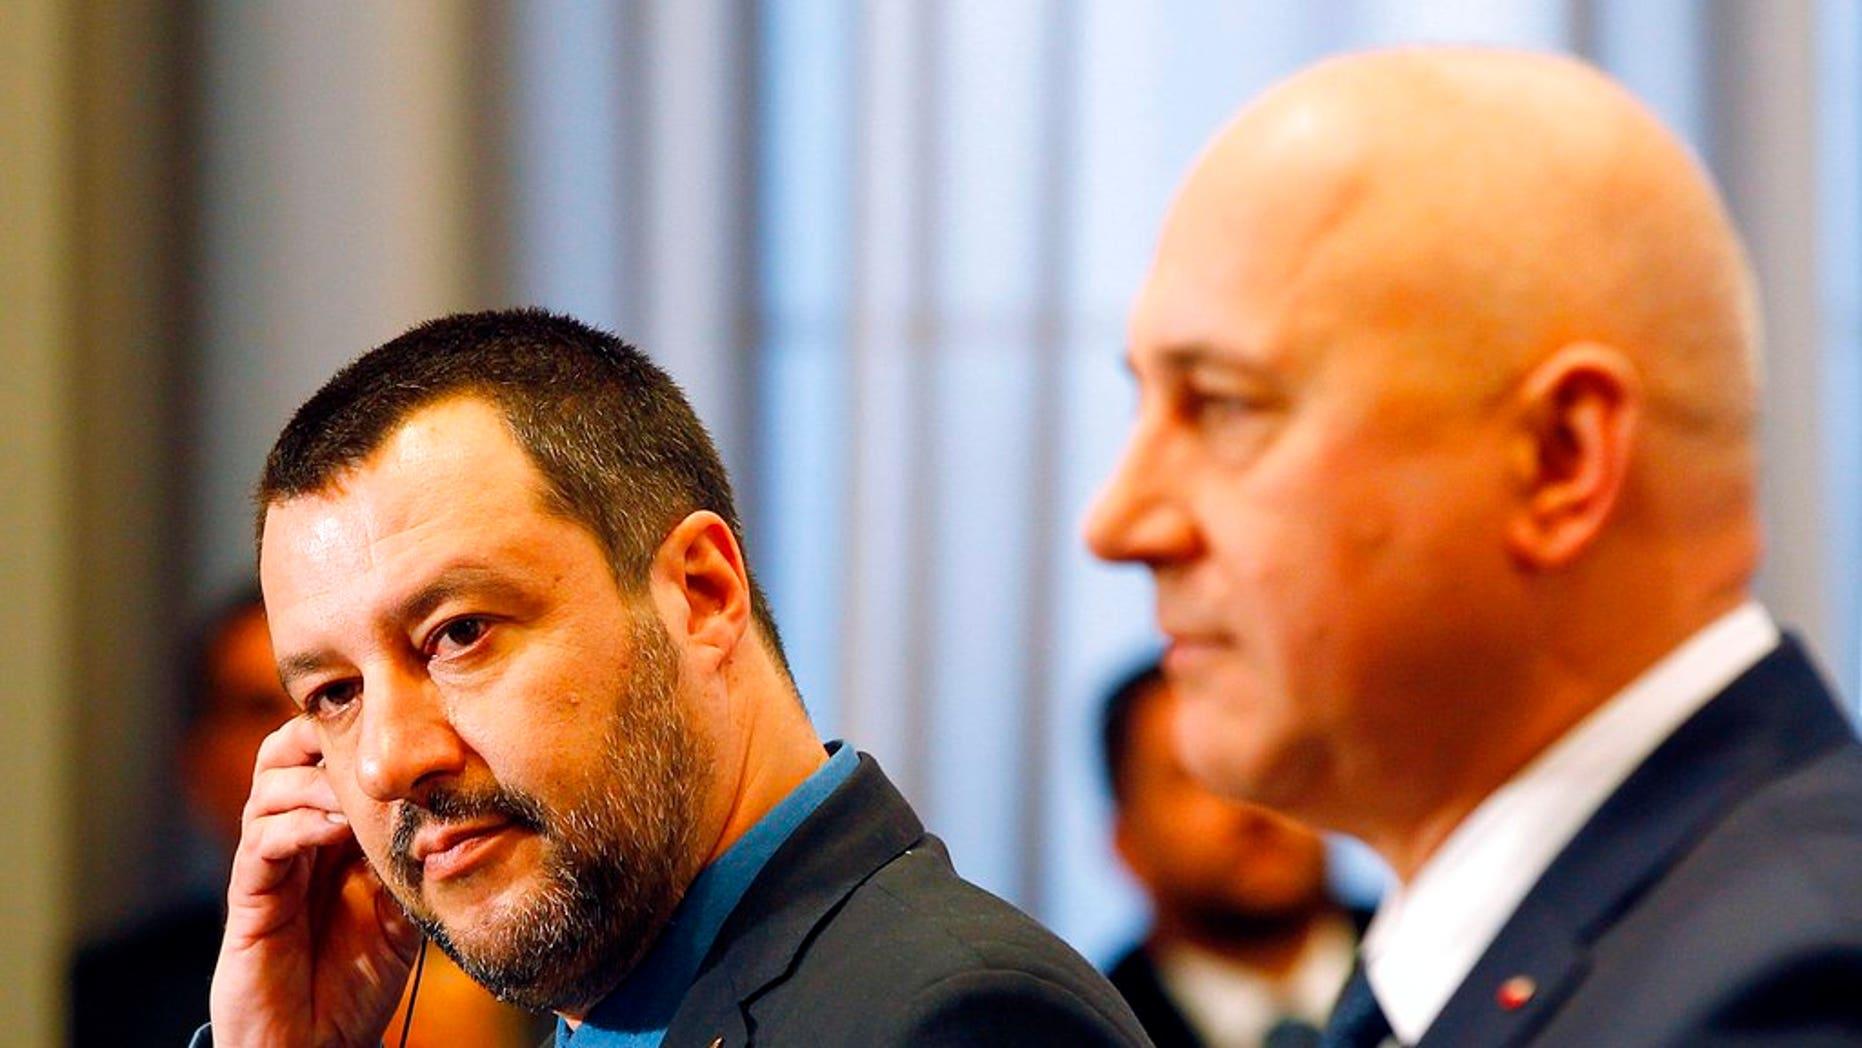 Italian Interior Minister Matteo Salvini, left, and his Polish counterpart Joachim Brudzinski, right, address the media following their talks in Warsaw, Poland, Wednesday, Jan. 9, 2019.